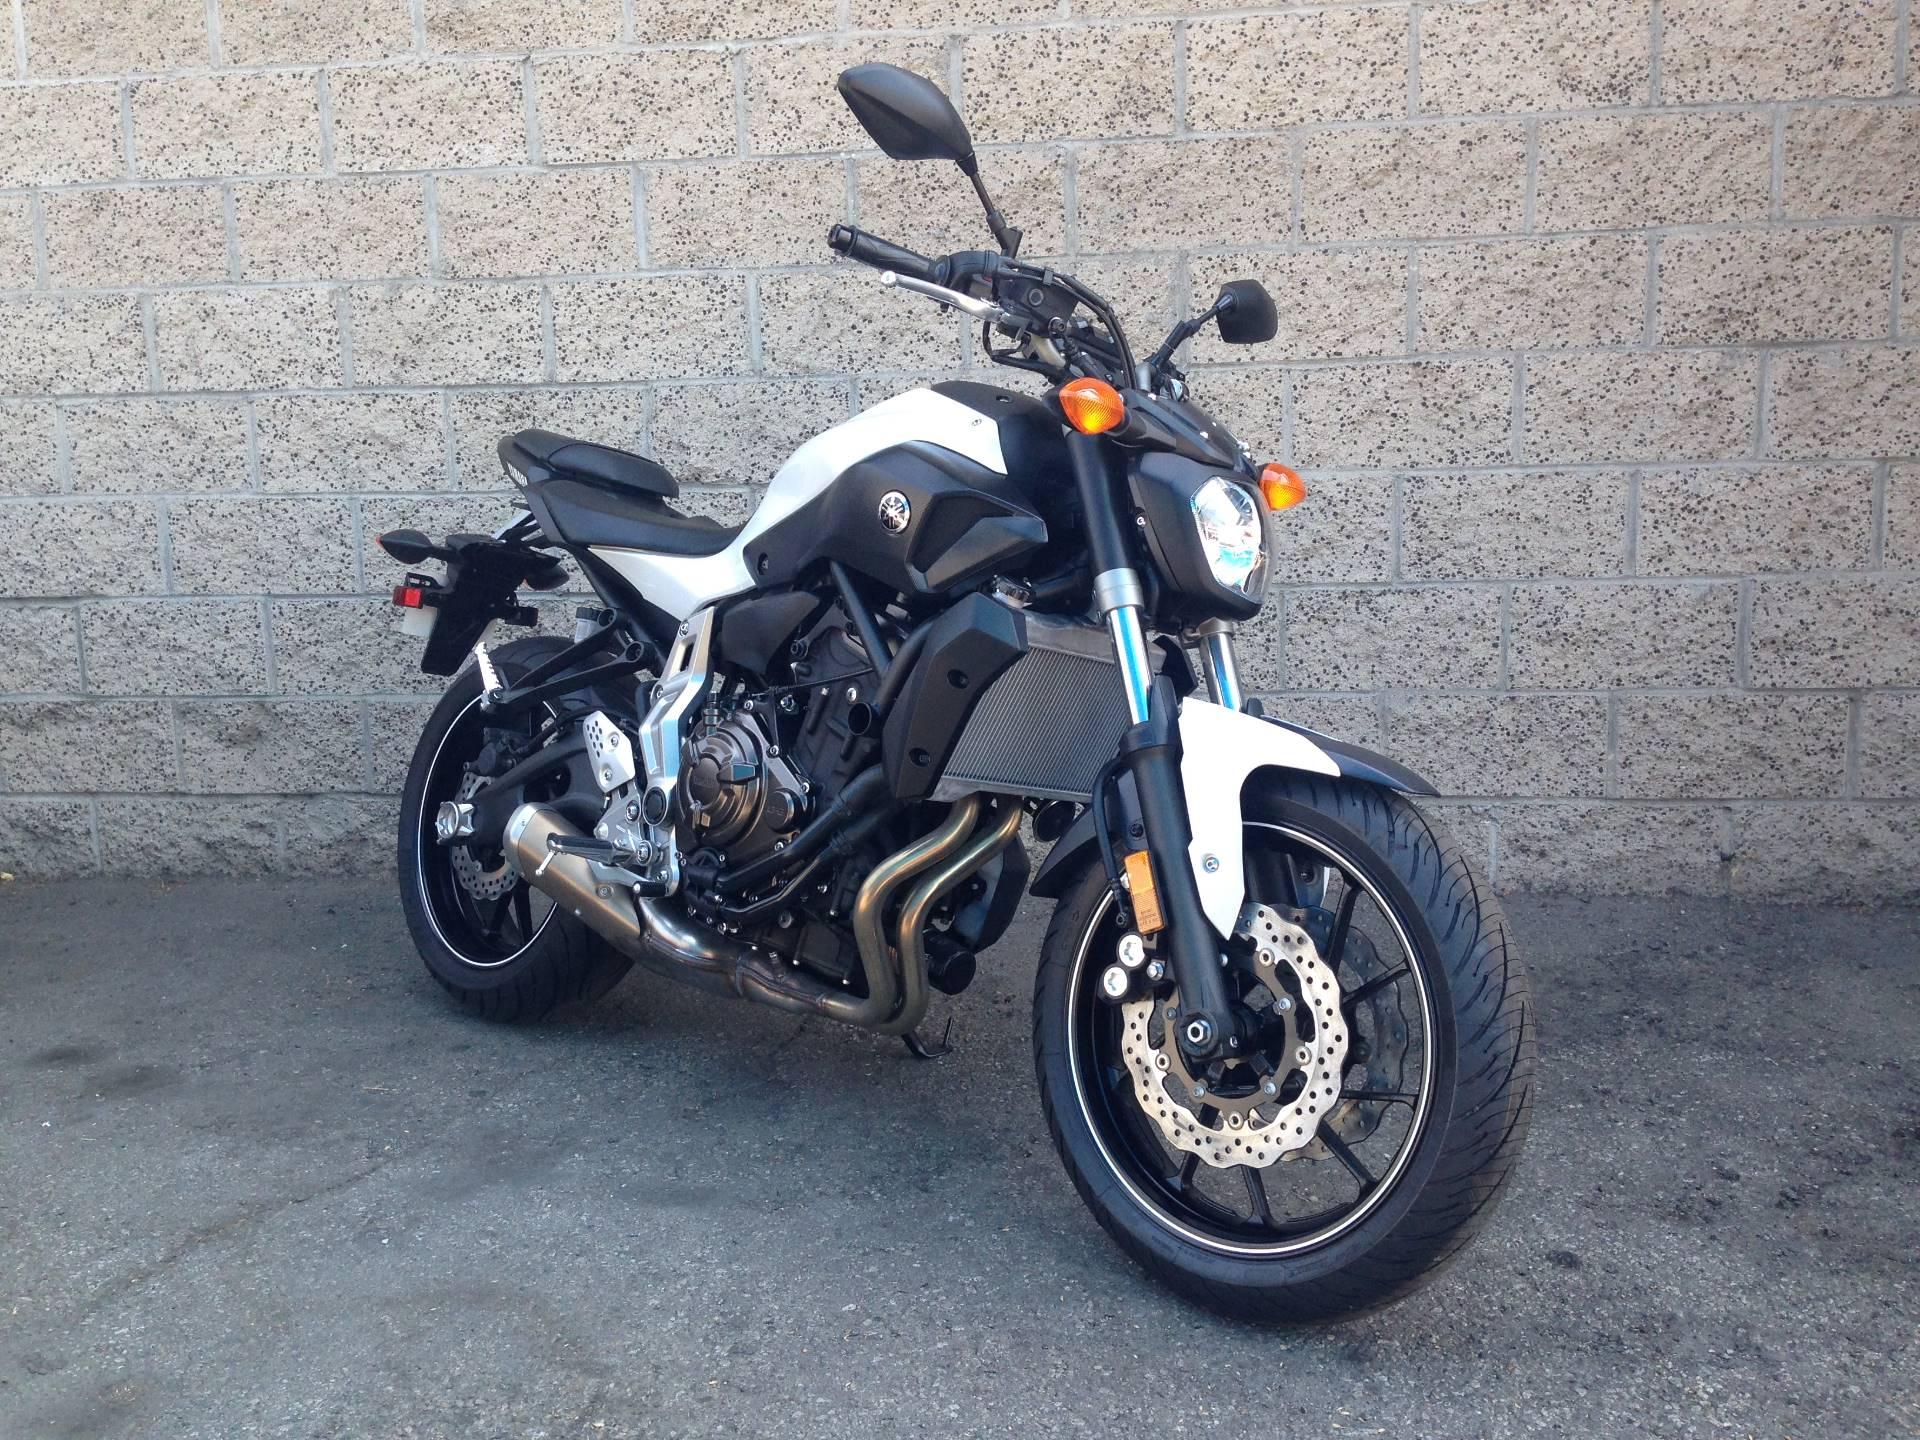 2017 Yamaha FZ-07 for sale 48320